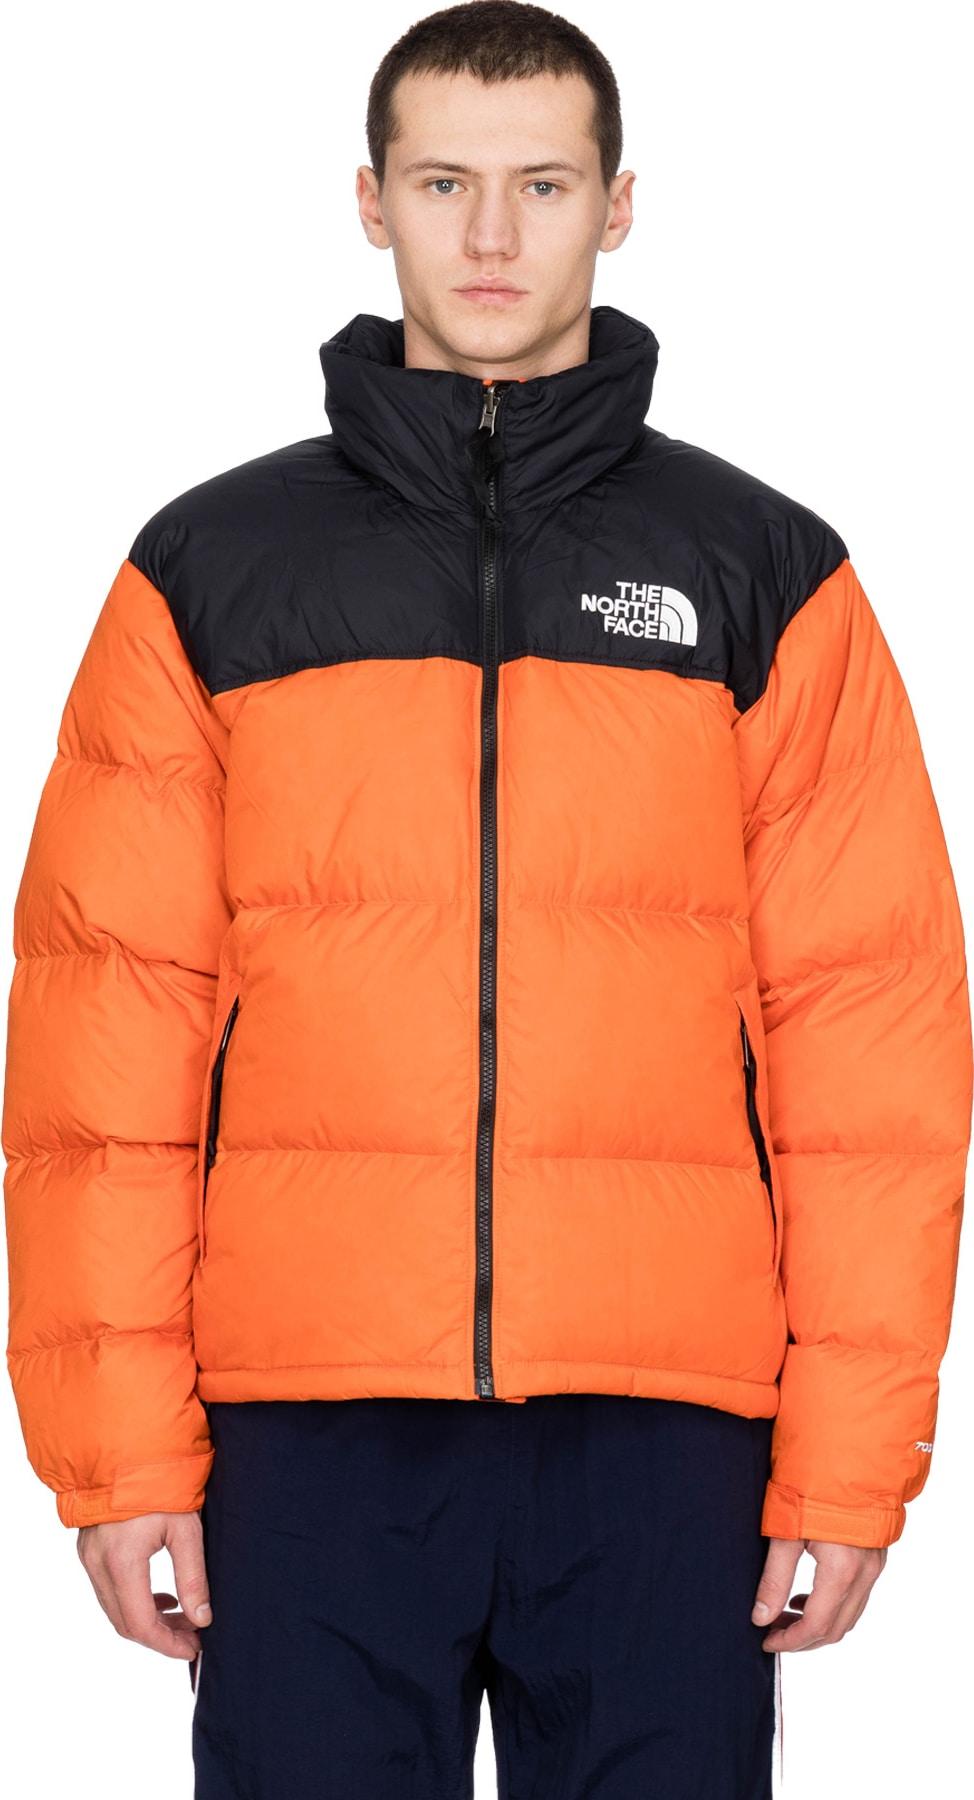 clearance sale performance sportswear better The North Face - 1996 Retro Nuptse Jacket - Persian Orange